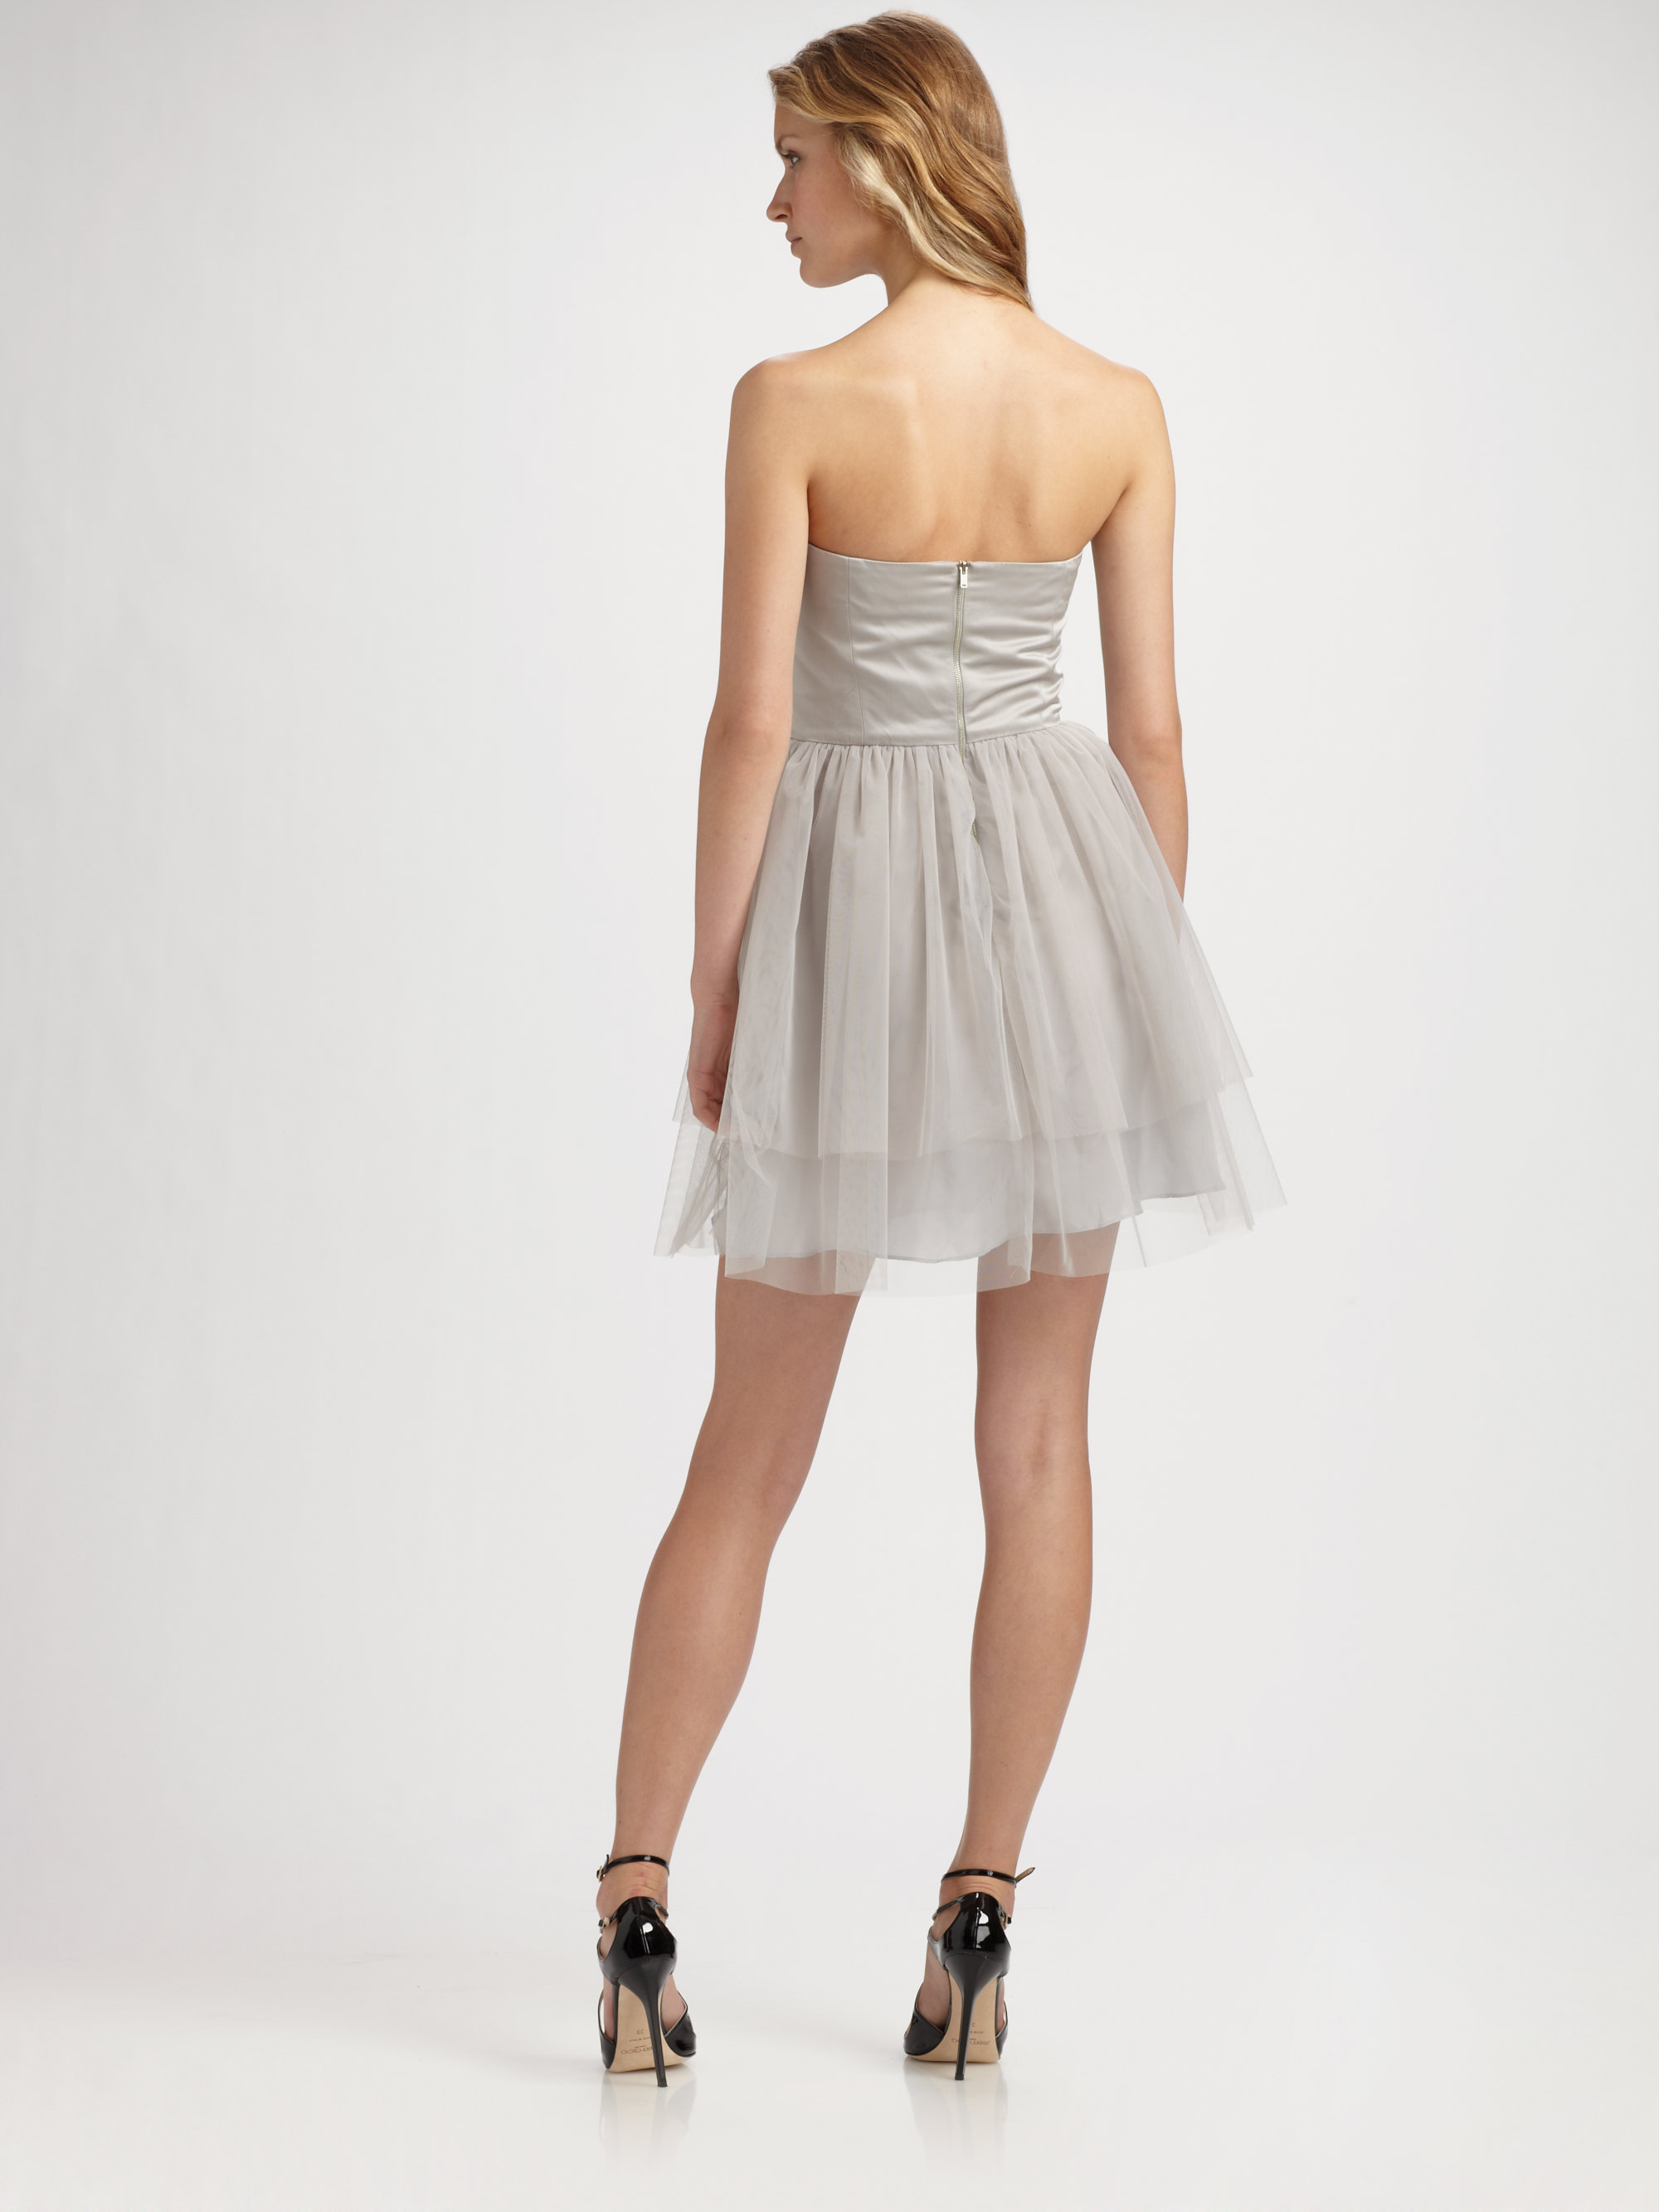 Kara janx Presley Strapless Tutu Dress in Gray | Lyst